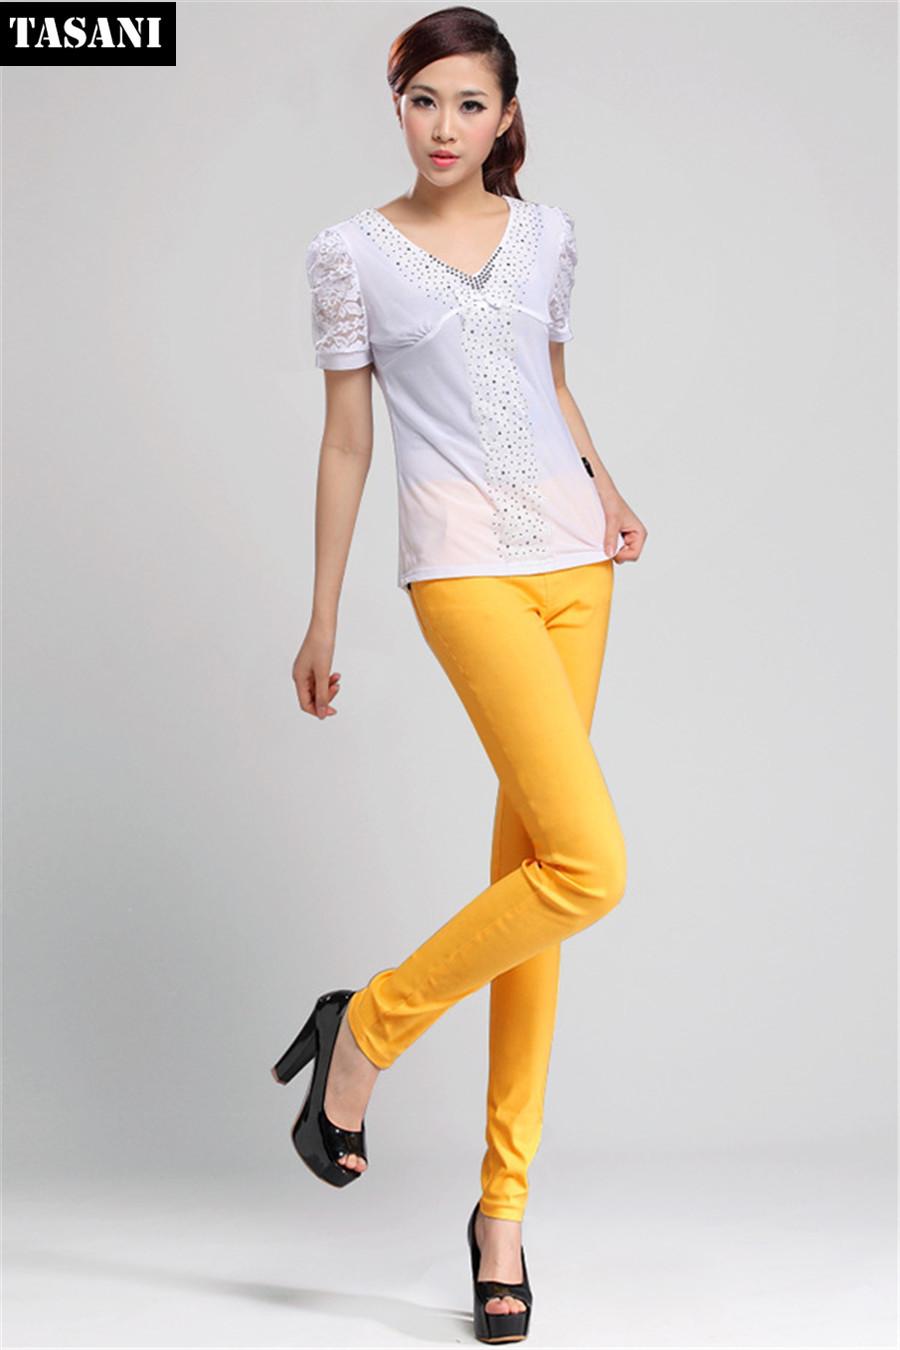 Plus 2015 New Fashion Spring Cotton Women Leggings Candy Color High Waist Pencil Elasticity Pants K3200 - TASANI store